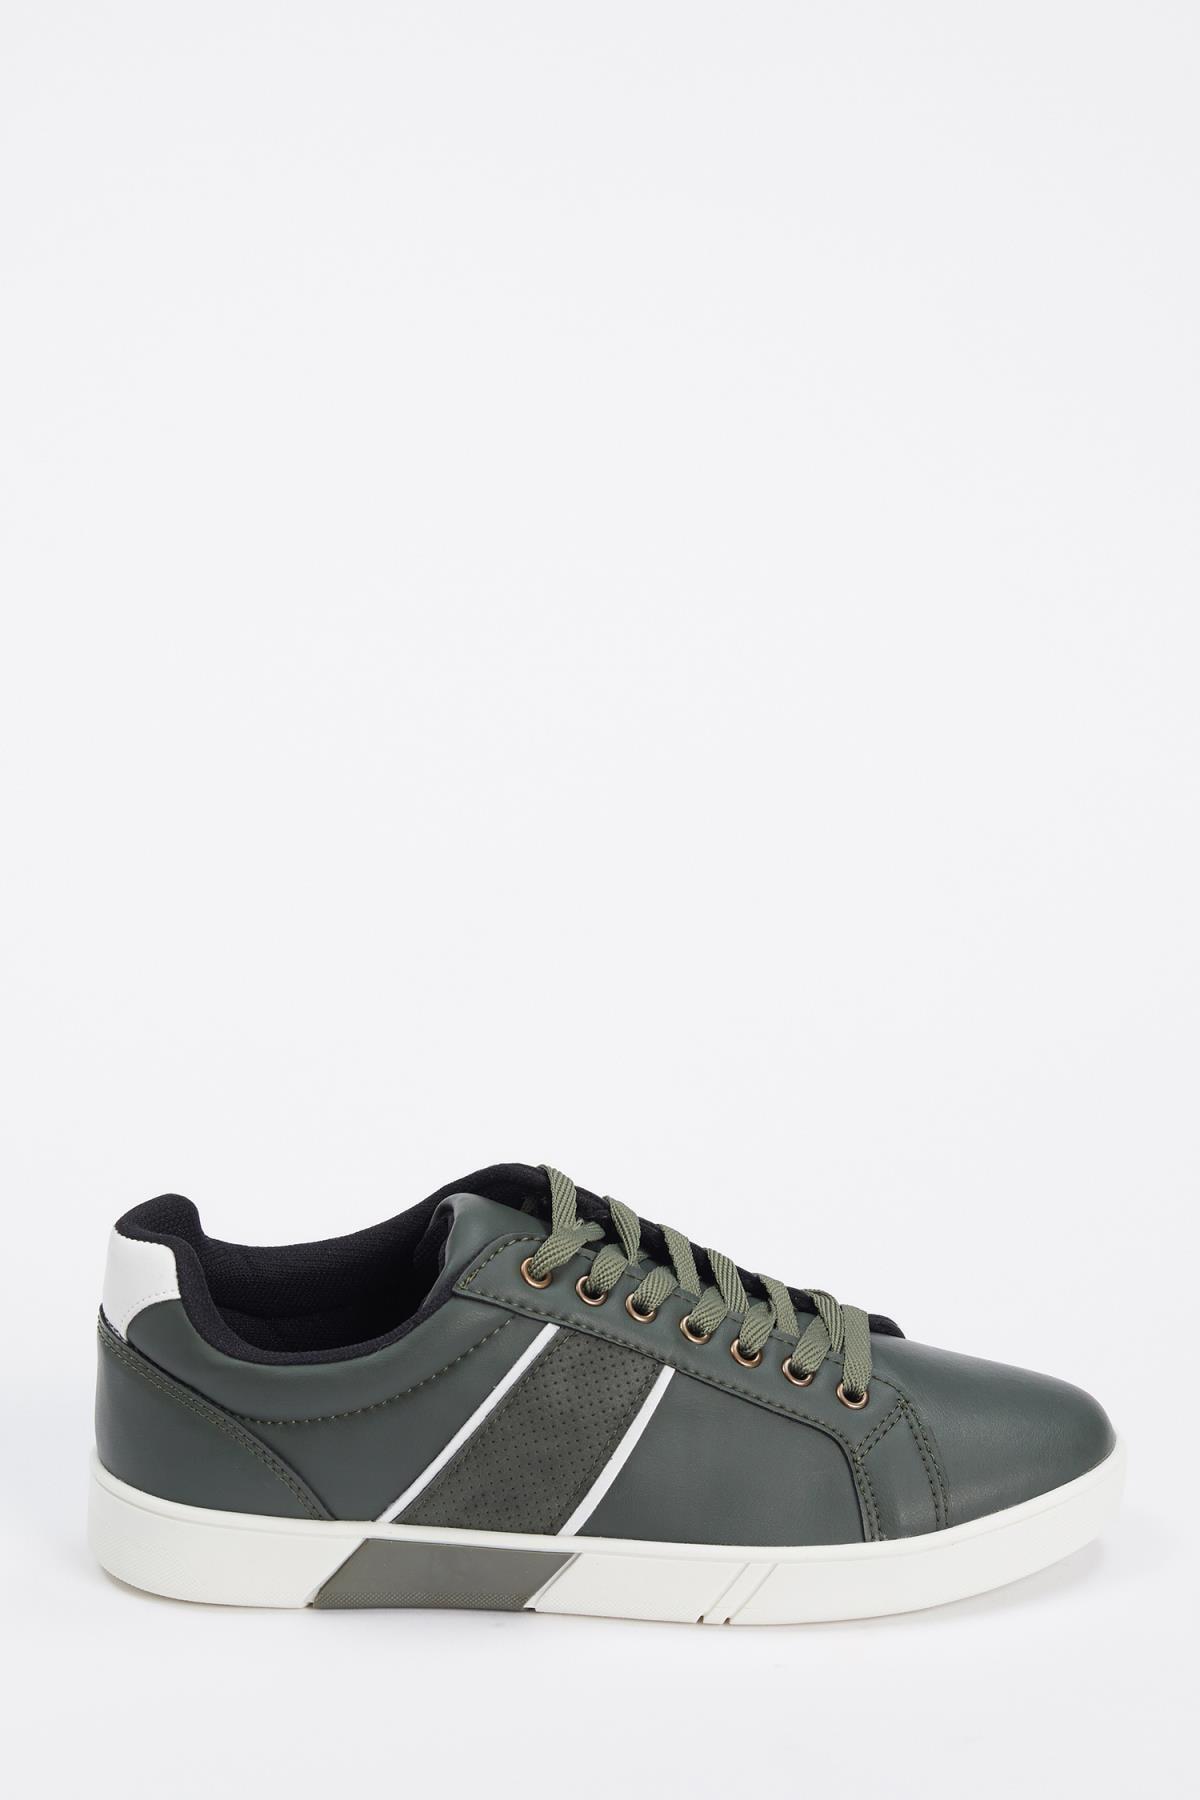 DeFacto Erkek Khakı Bağcıklı Sneaker Ayakkabı S5646AZ20AU